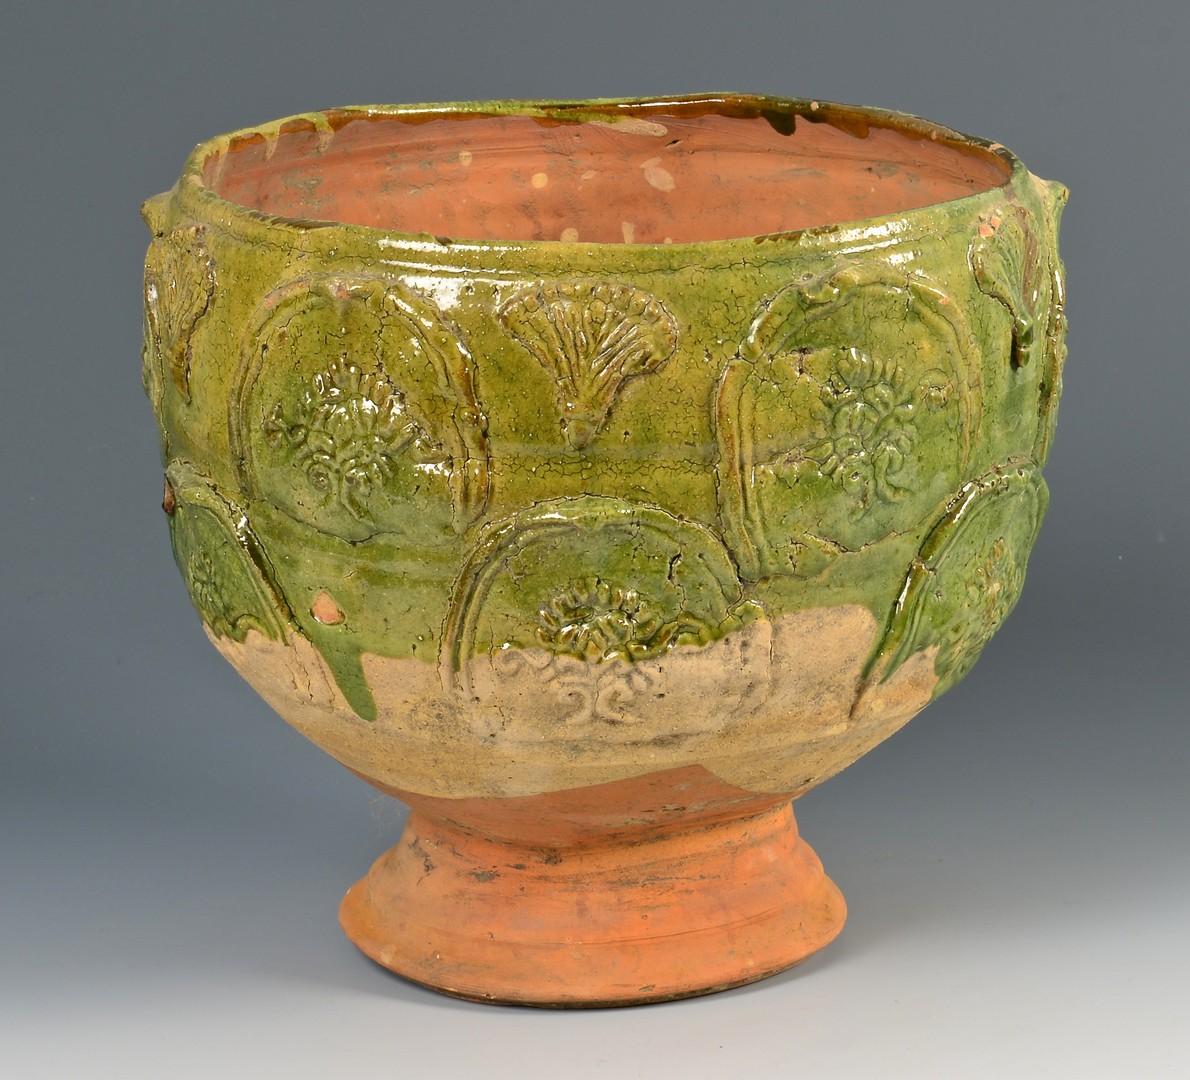 Lot 379: Chinese Ceramic Yuan Dynasty Storage Jar